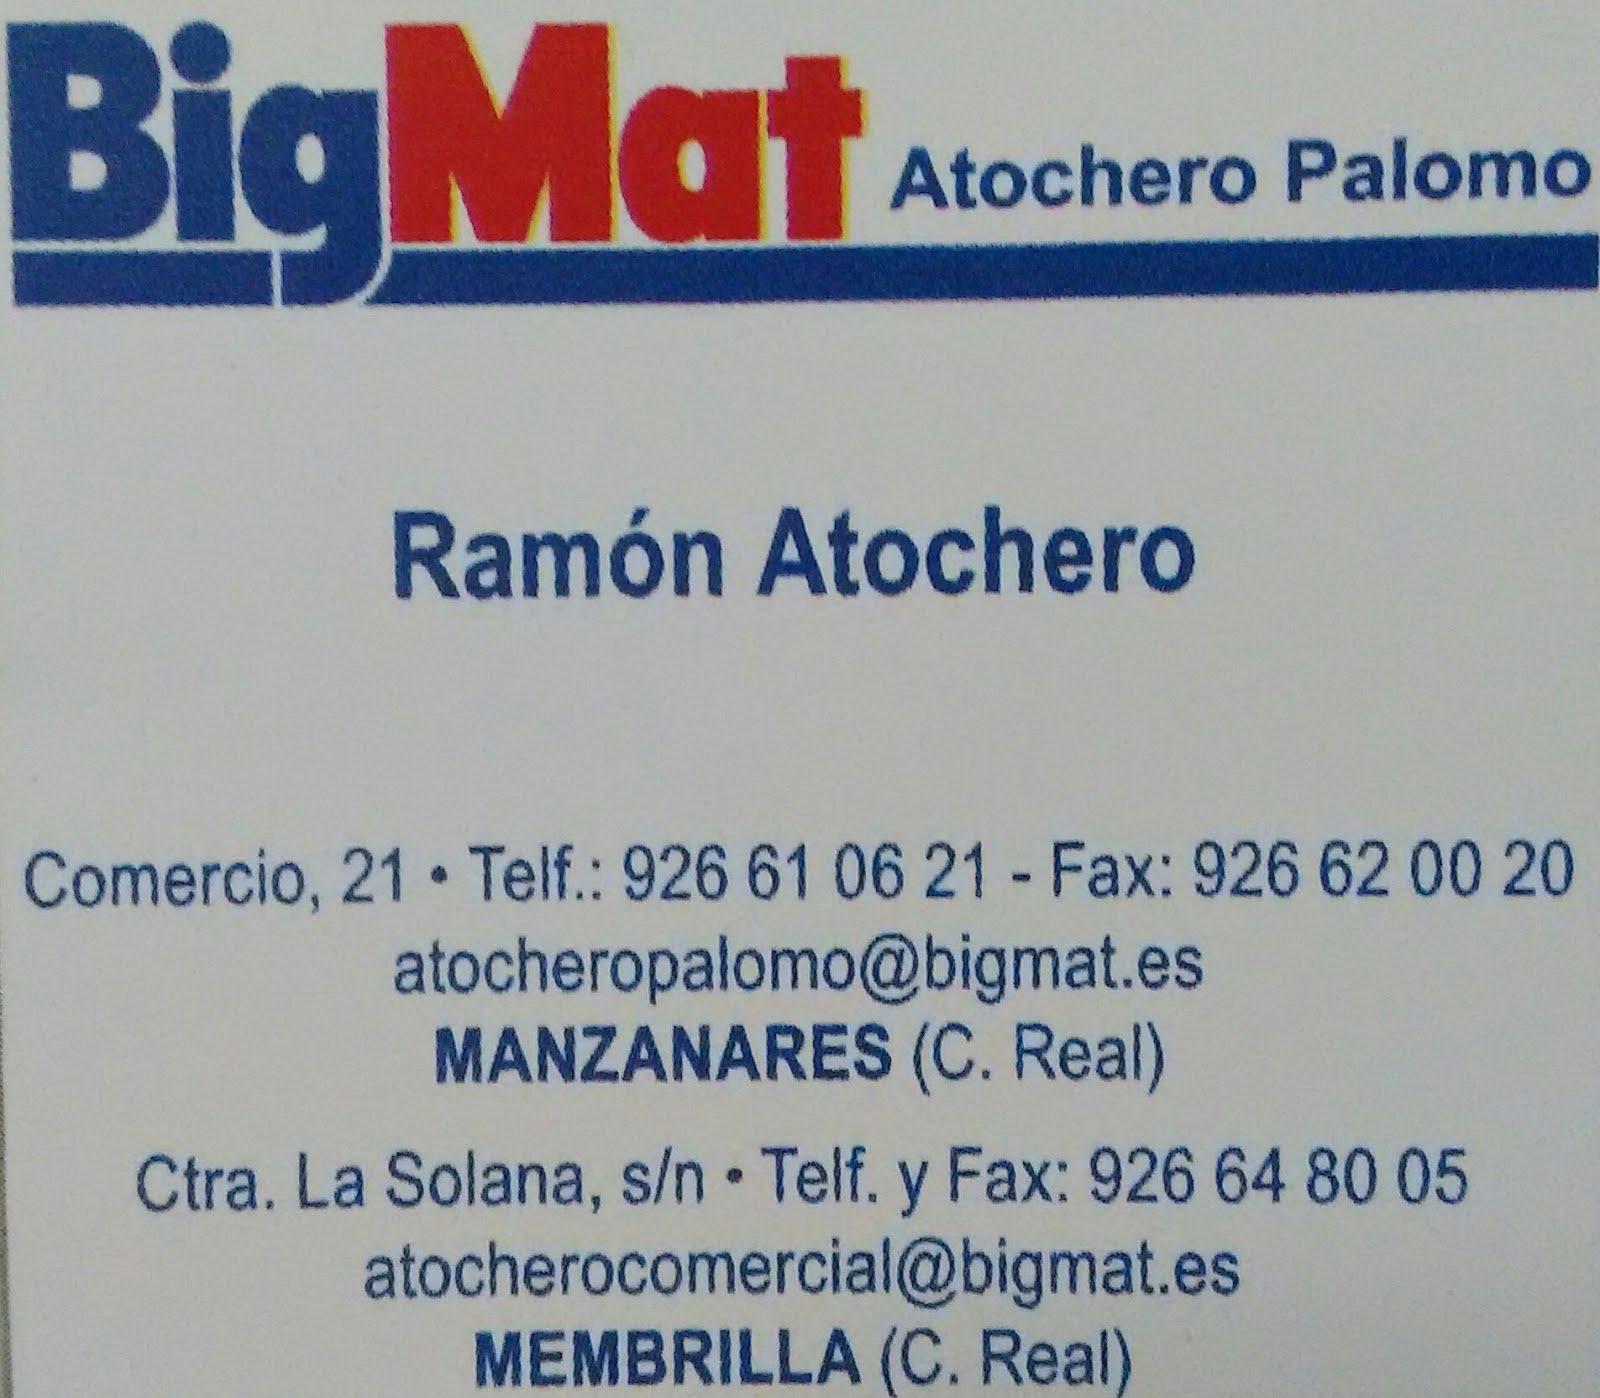 BIGMAT ATOCHERO PALOMO